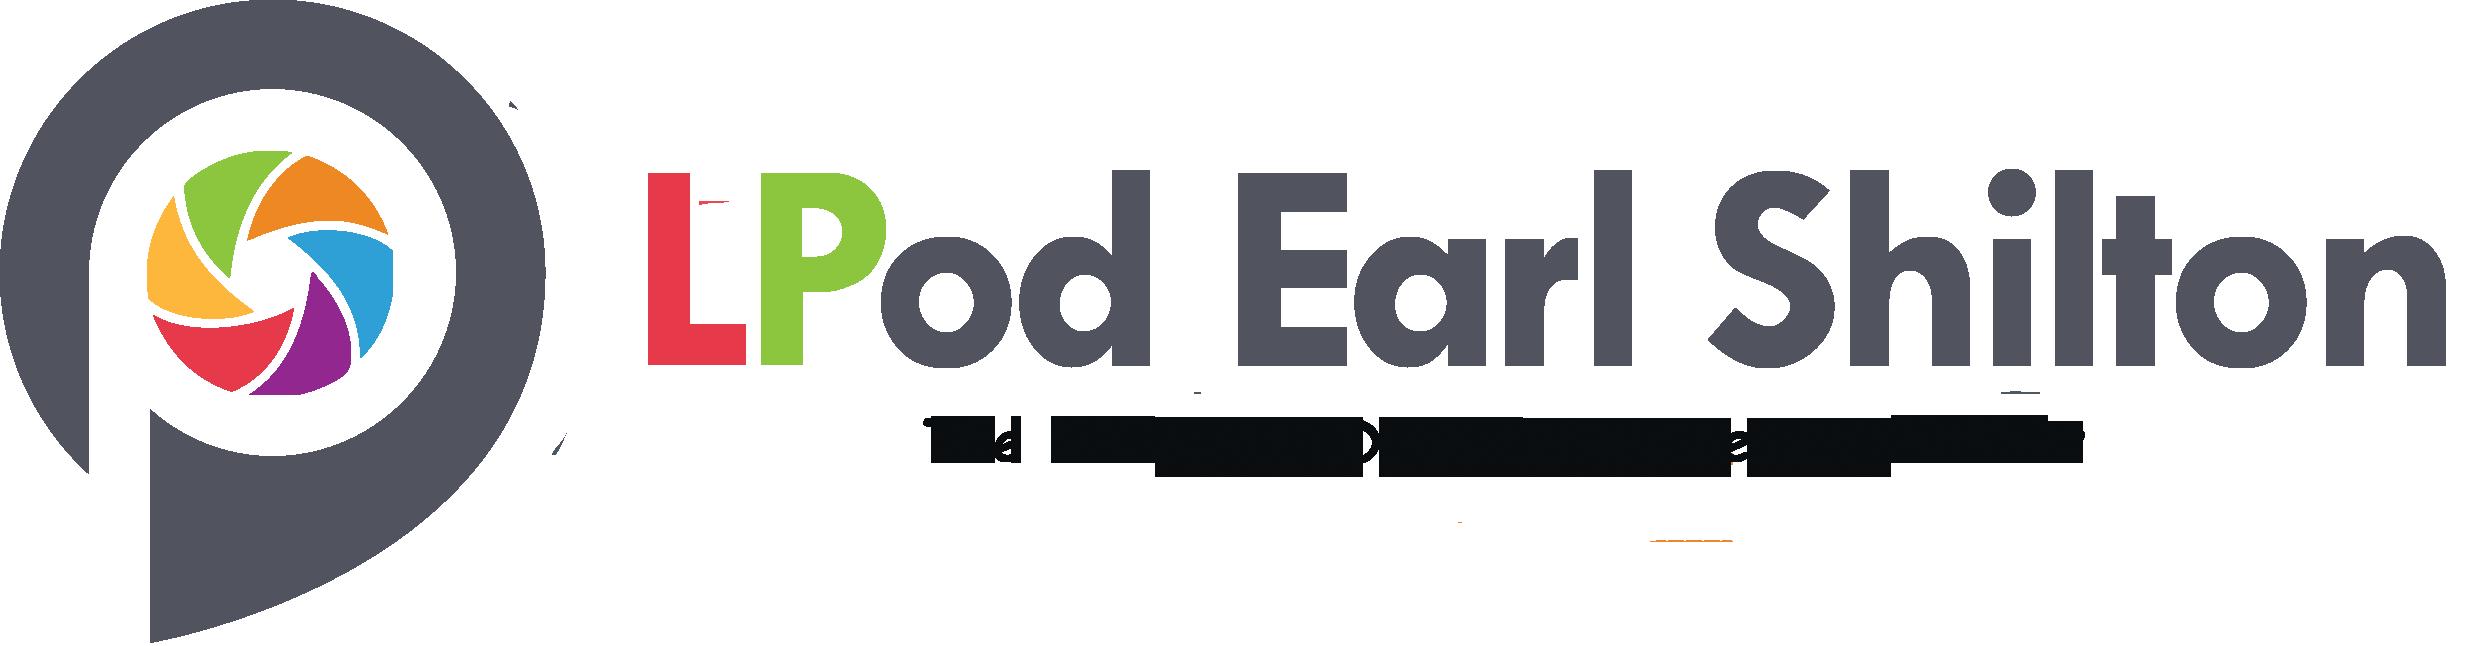 intensive driving courses Earl Shilton